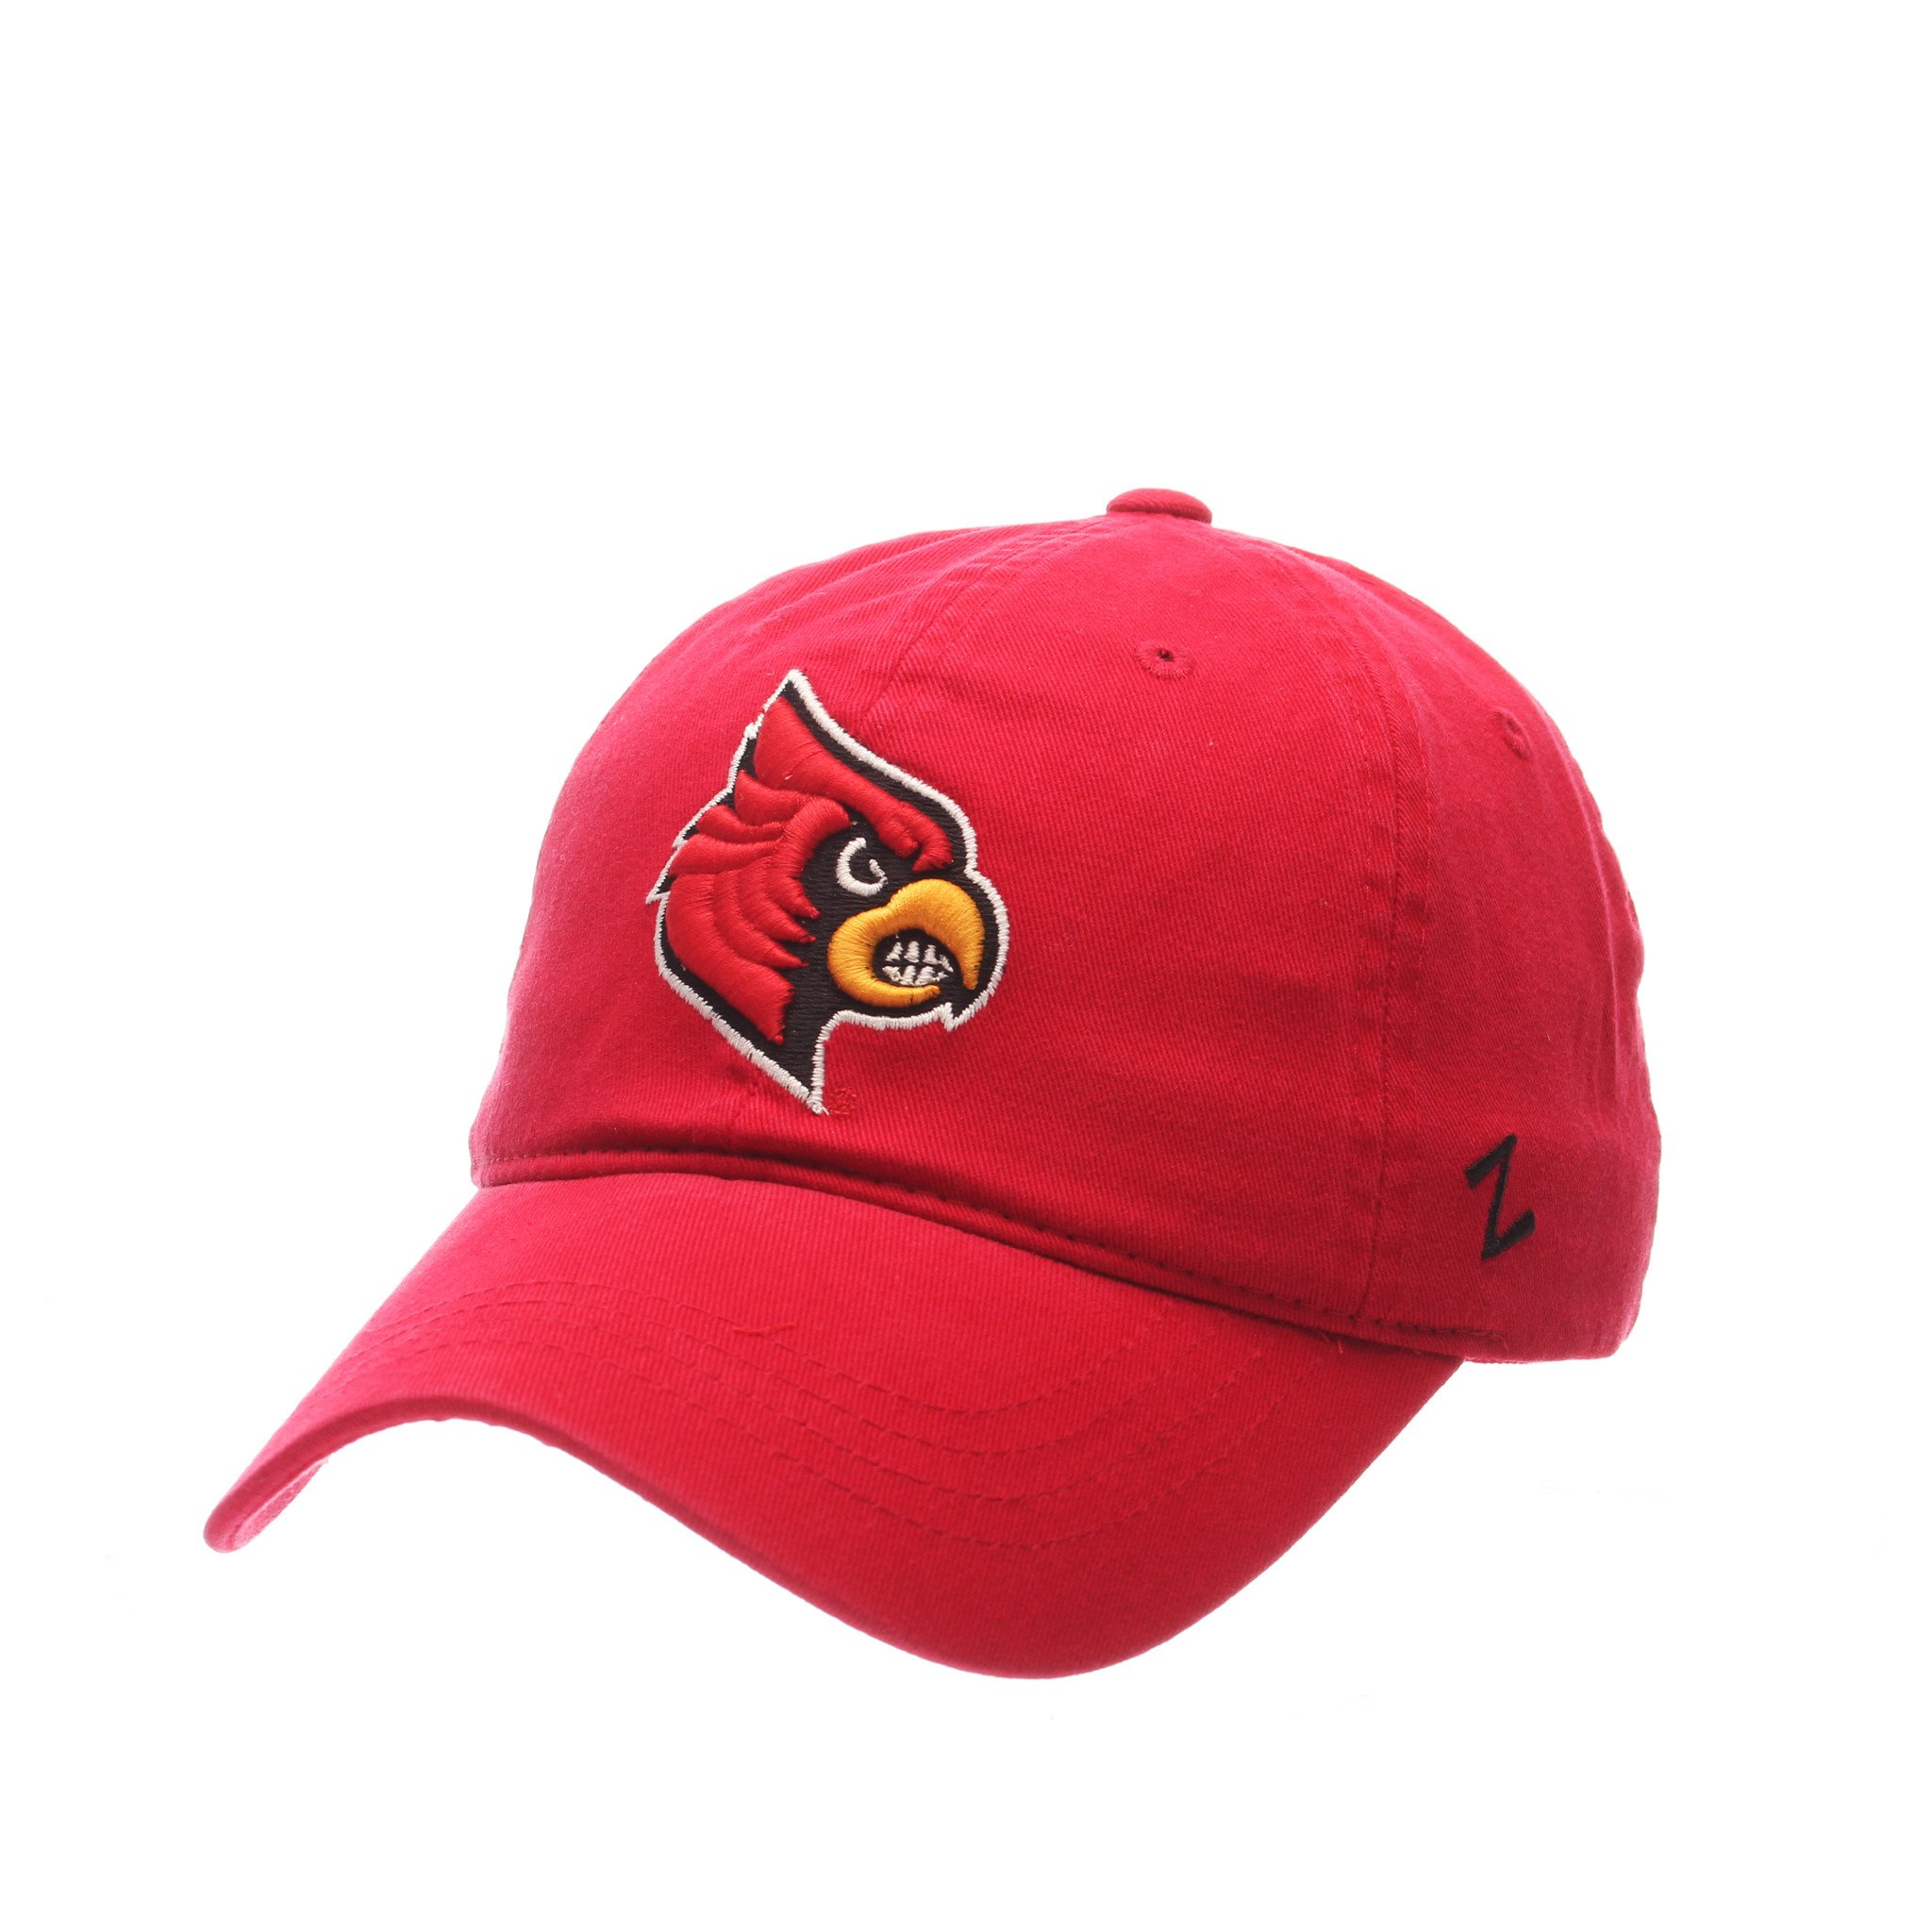 Louisville Cardinals Official NCAA Scholarship Adjustable Hat Cap by Zephyr 519073